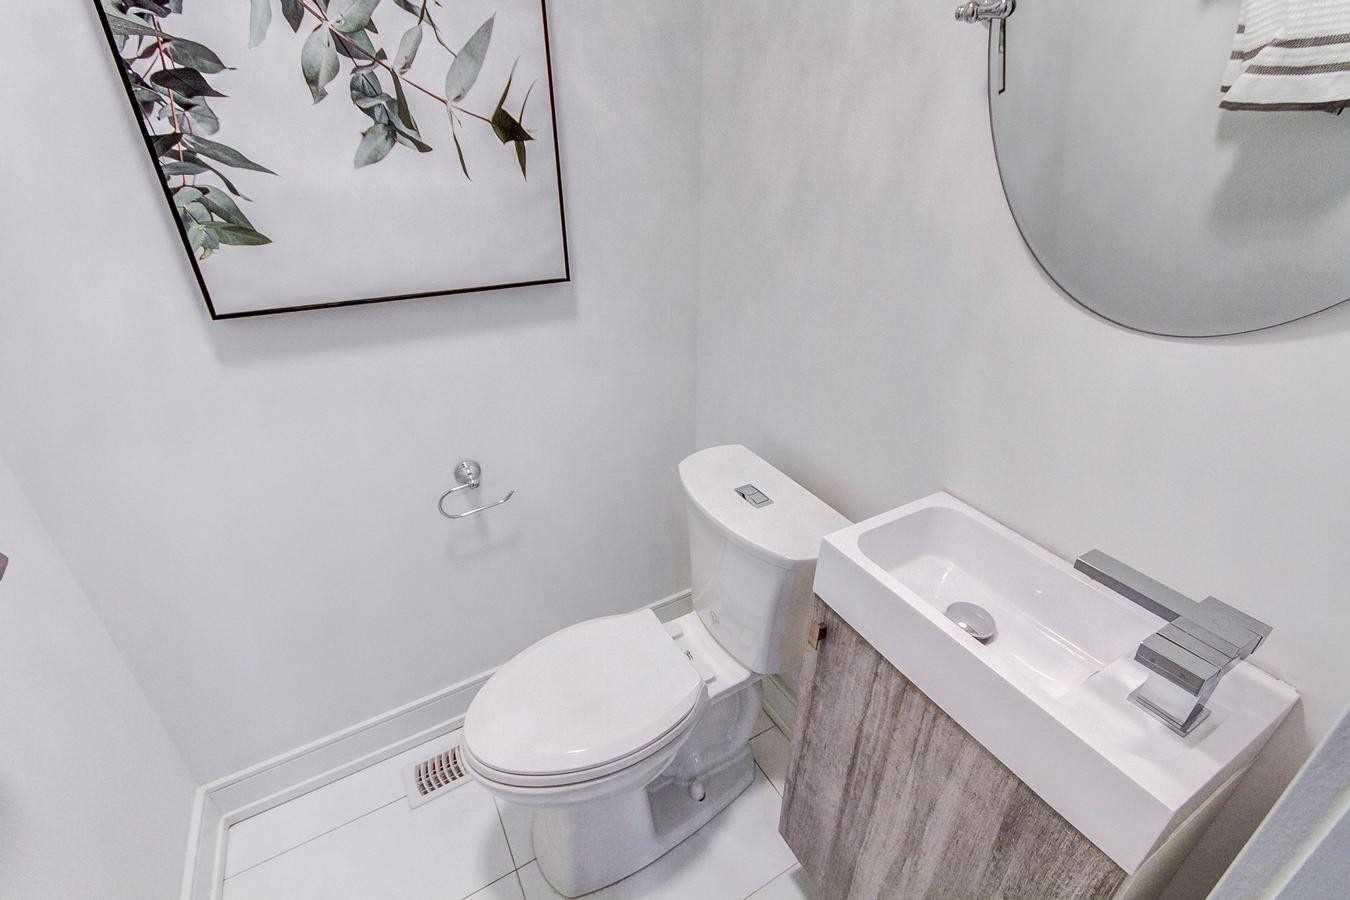 97 Woodfield Rd, Toronto, Ontario M4L2W5, 4 Bedrooms Bedrooms, 9 Rooms Rooms,5 BathroomsBathrooms,Detached,For Sale,Woodfield,E5086968